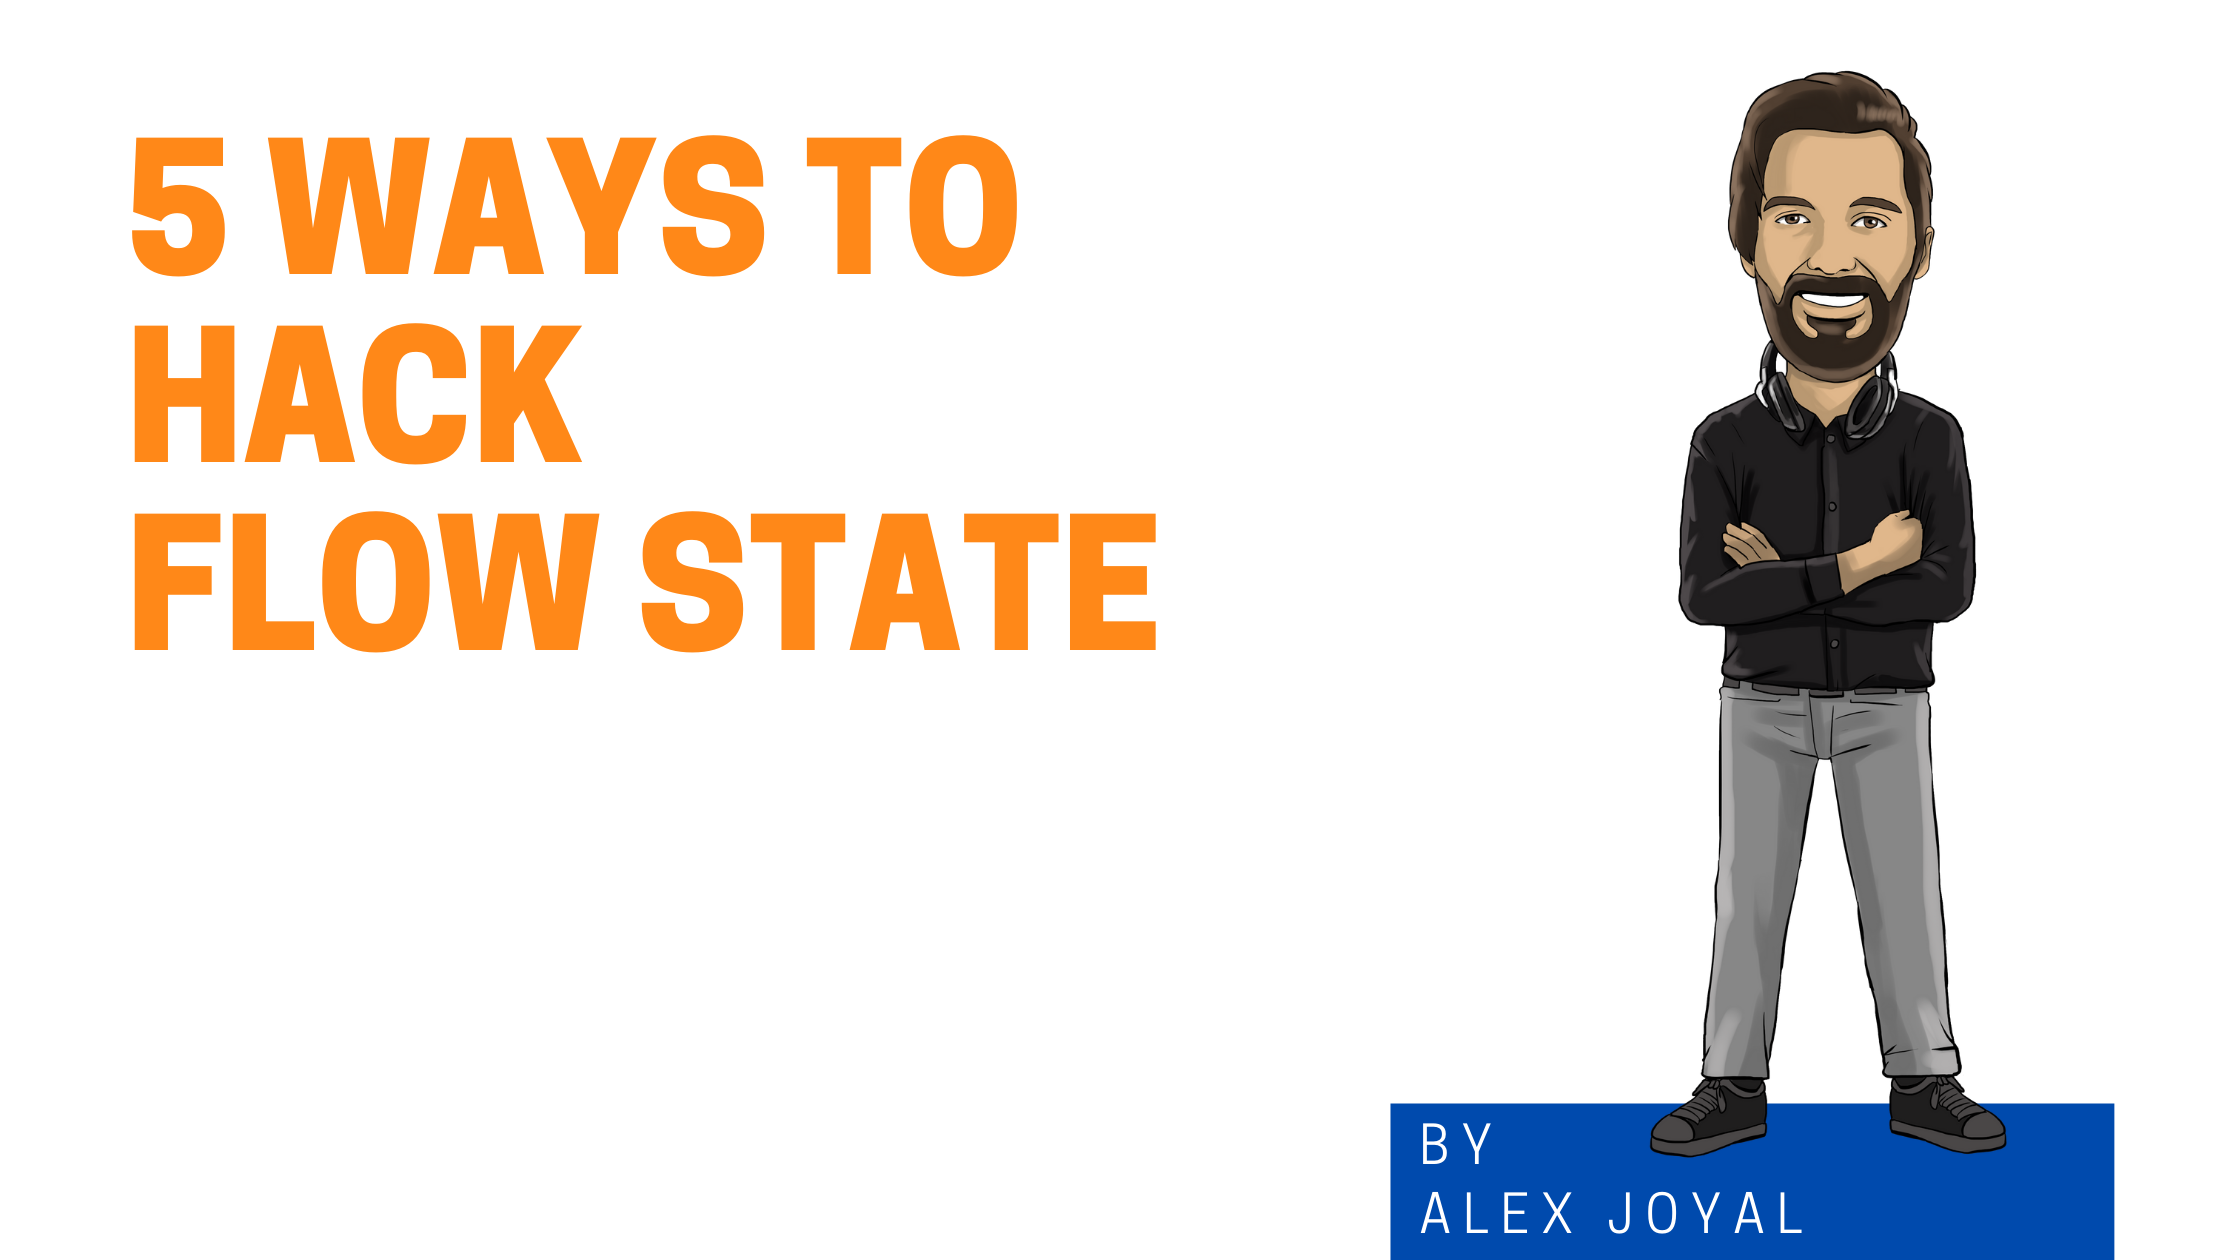 55 Ways To Hack Flow State image with cartoon Alex